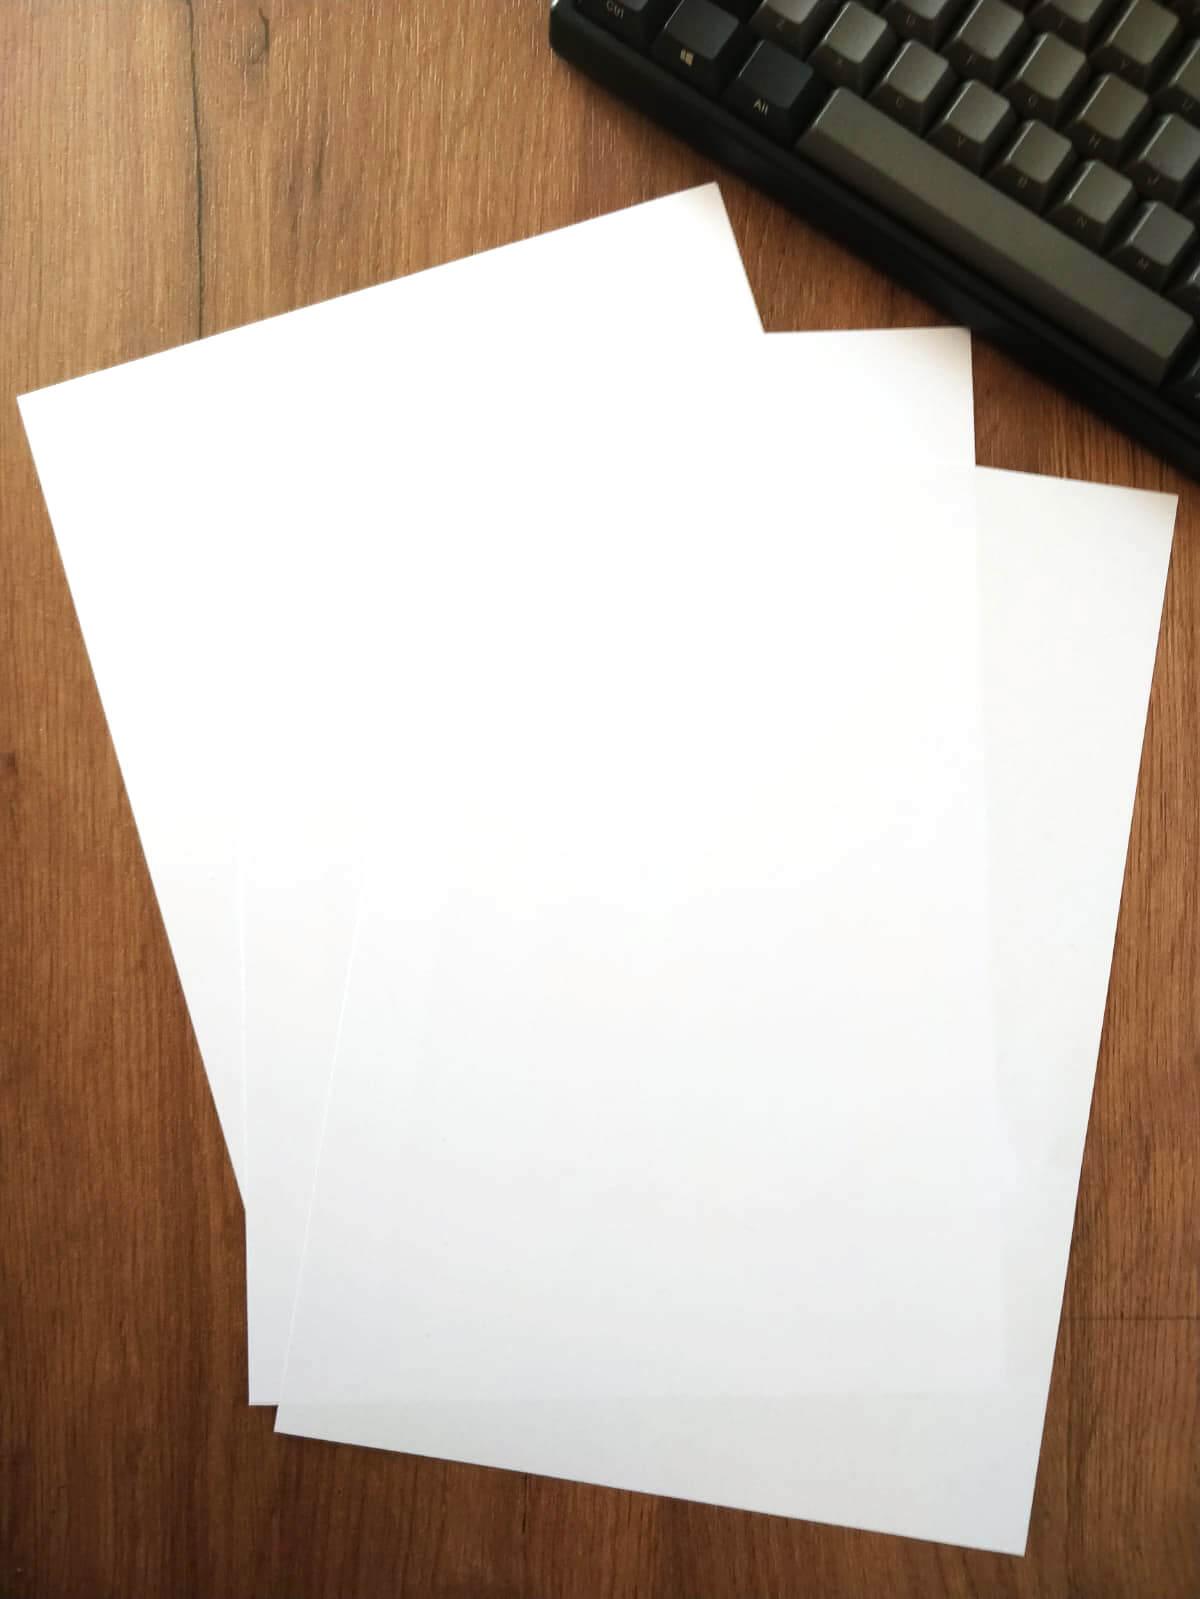 Clean White Paper - OK